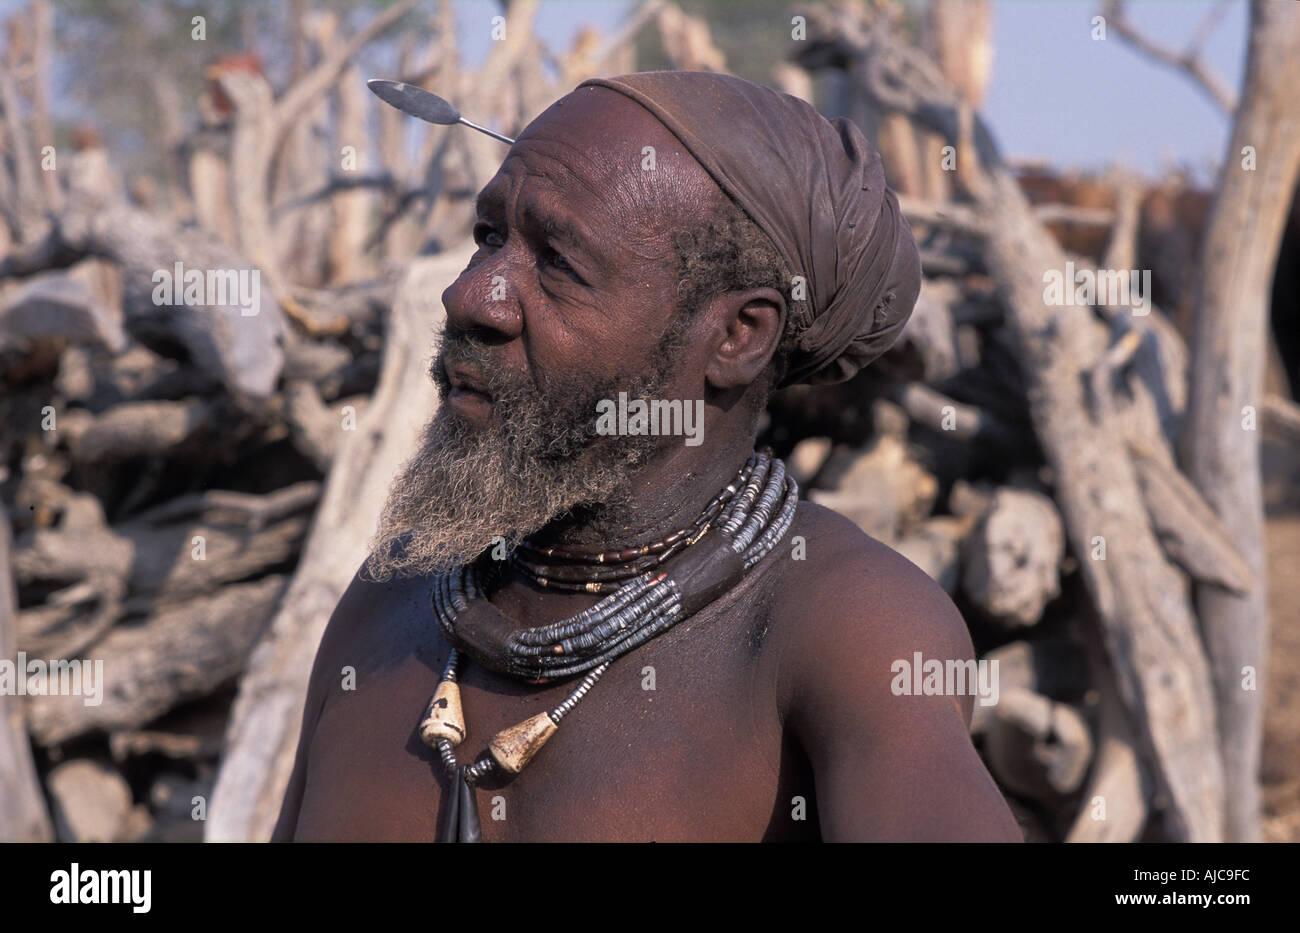 Himba Chief Kaokoveld tribal areas North west of Opuwo Namibia - Stock Image